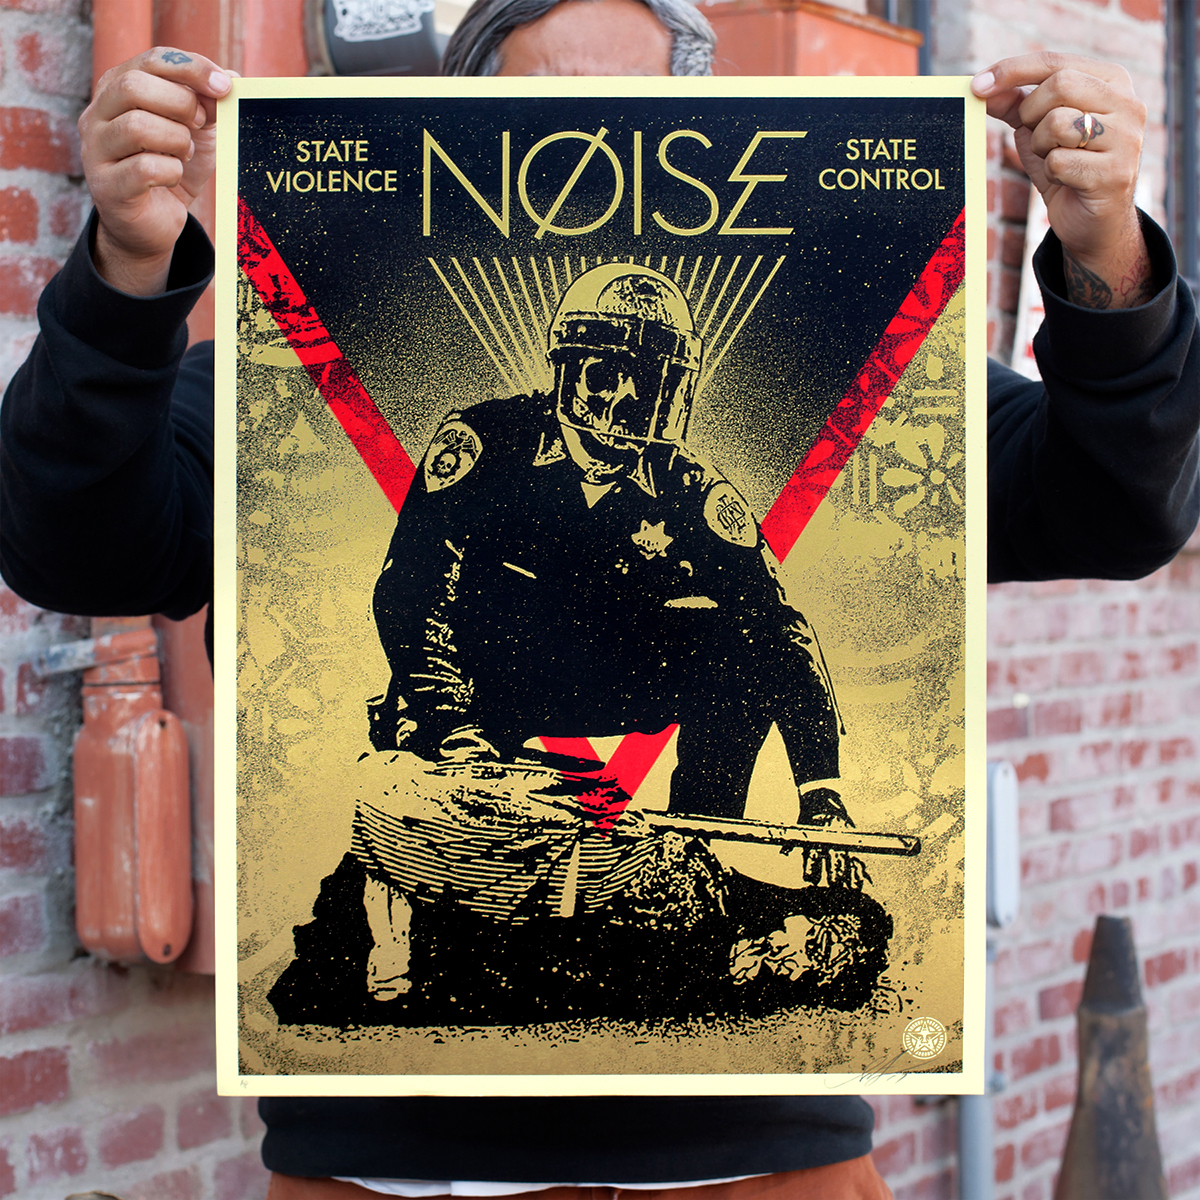 Noise-State Control-18x24%22 FNL.jpg